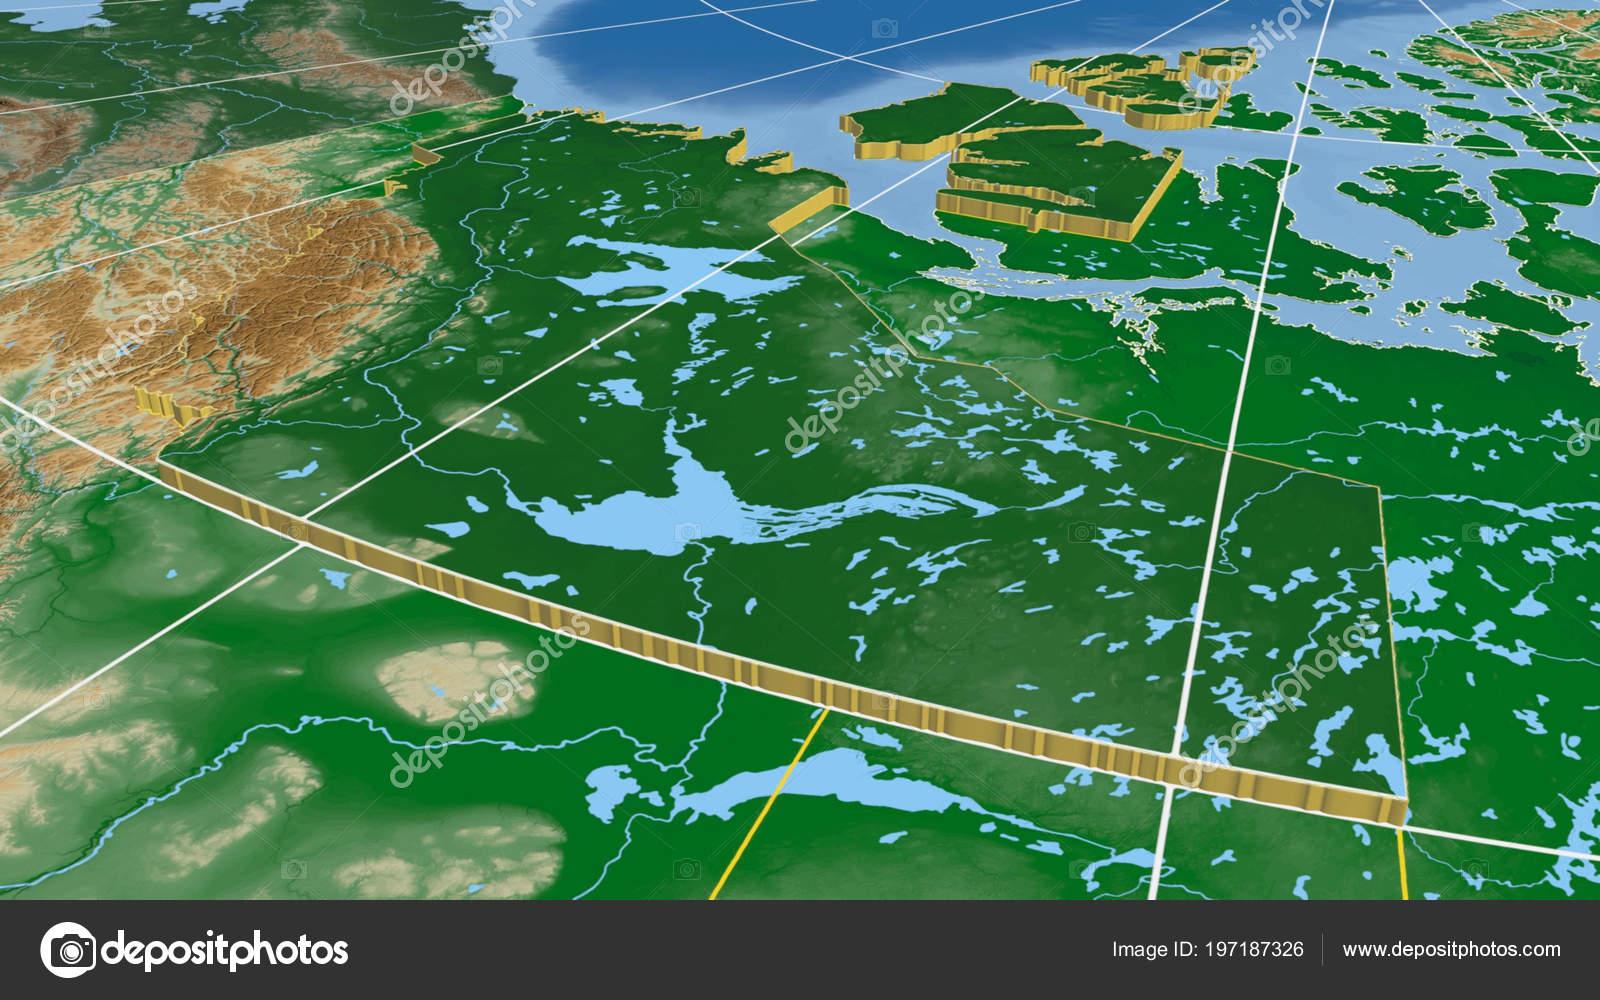 Carte Canada Region.Territoires Nord Ouest Region Canada Extrude Carte Physique Couleur